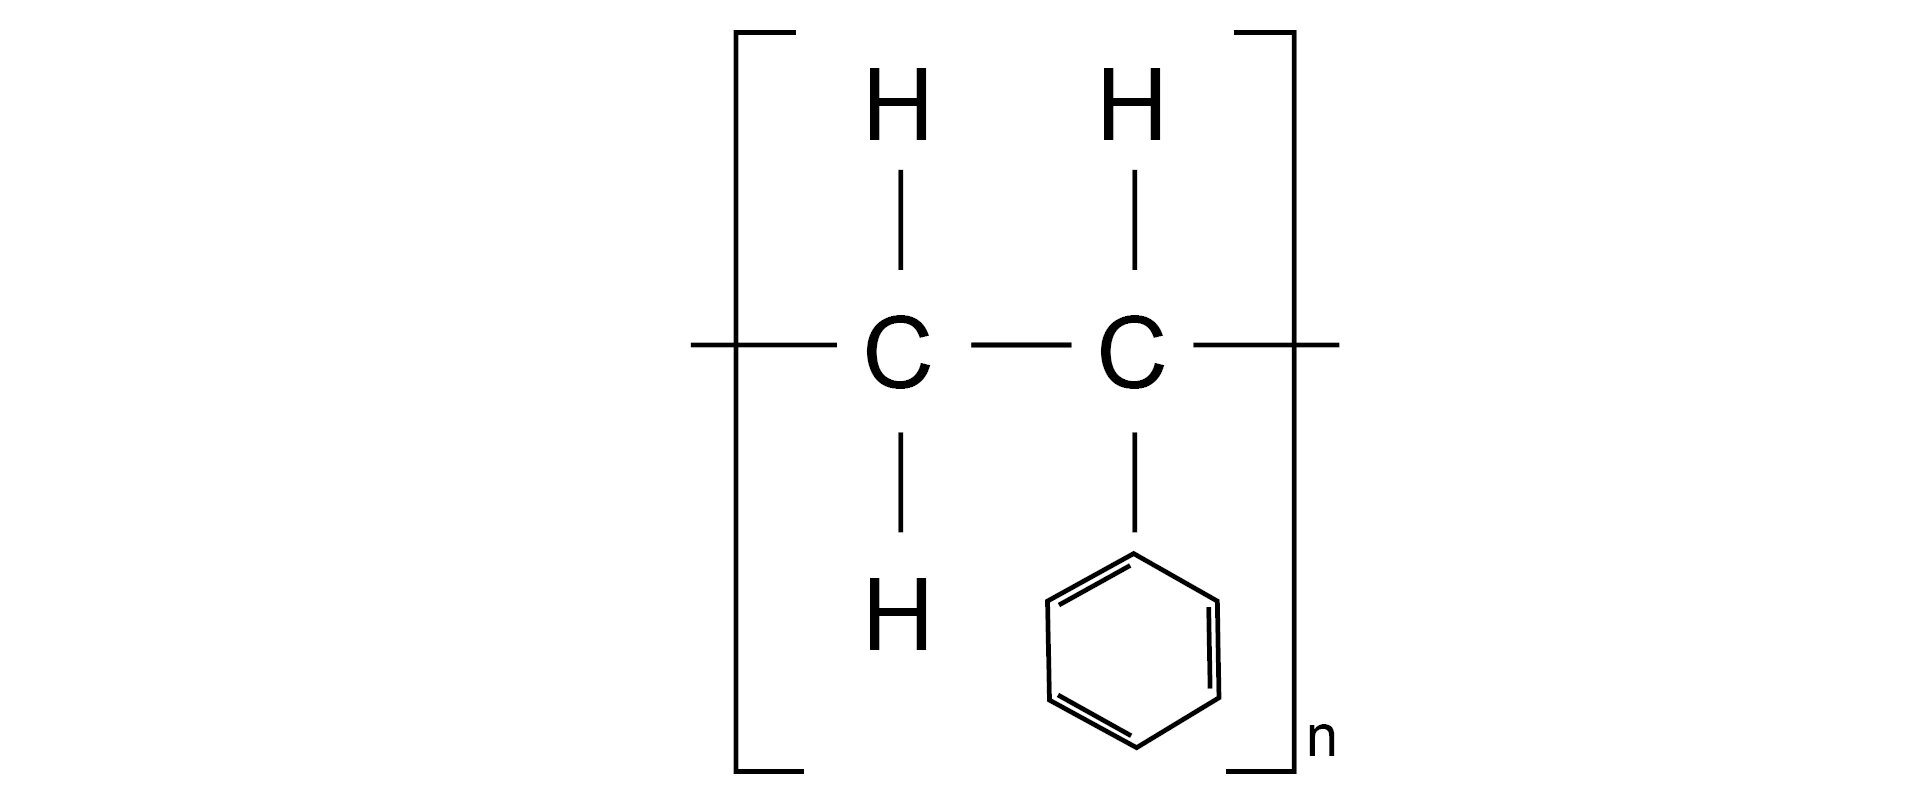 Ilustracja pokazuje wzór strukturalny polistyrenu.